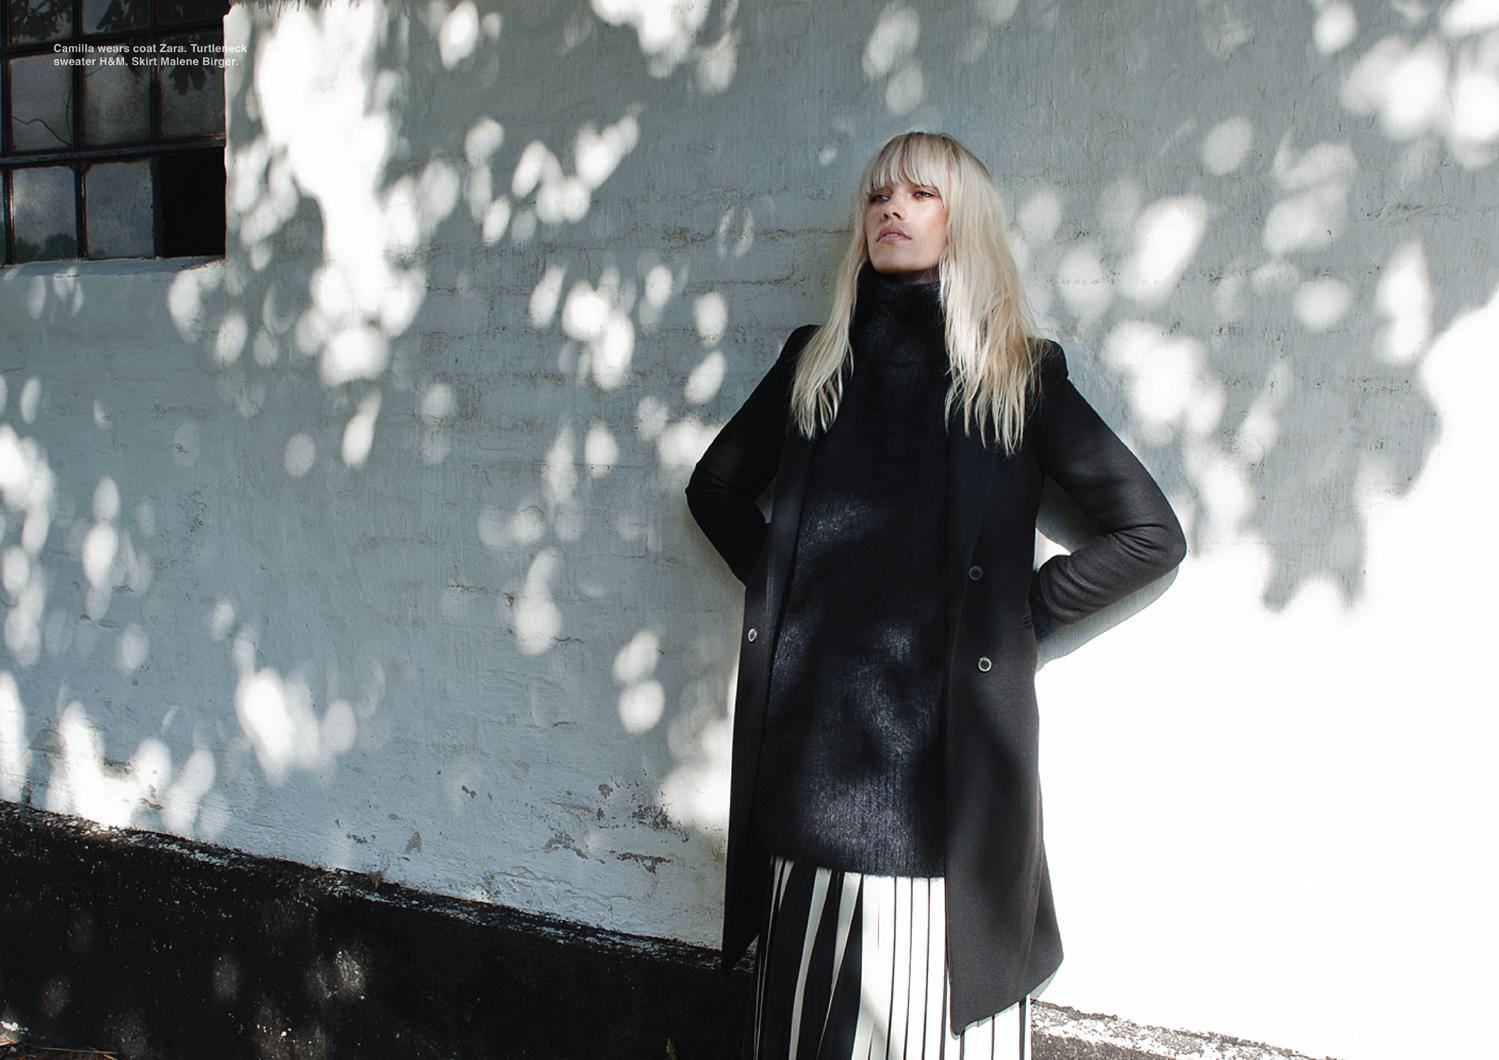 Camilla wears coat Zara. Turtle neck sweater H&M. Skirt Malene Birger.